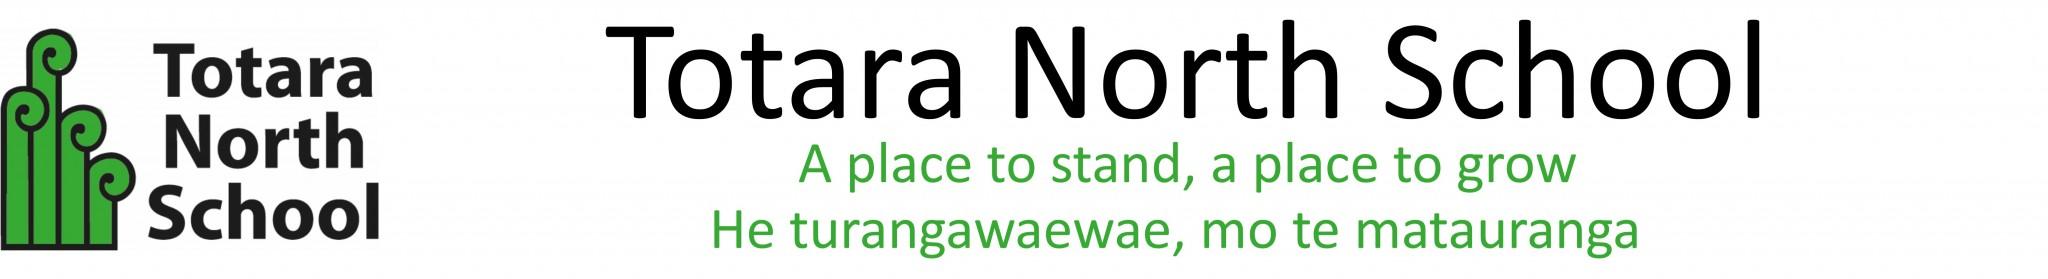 Totara North School Logo